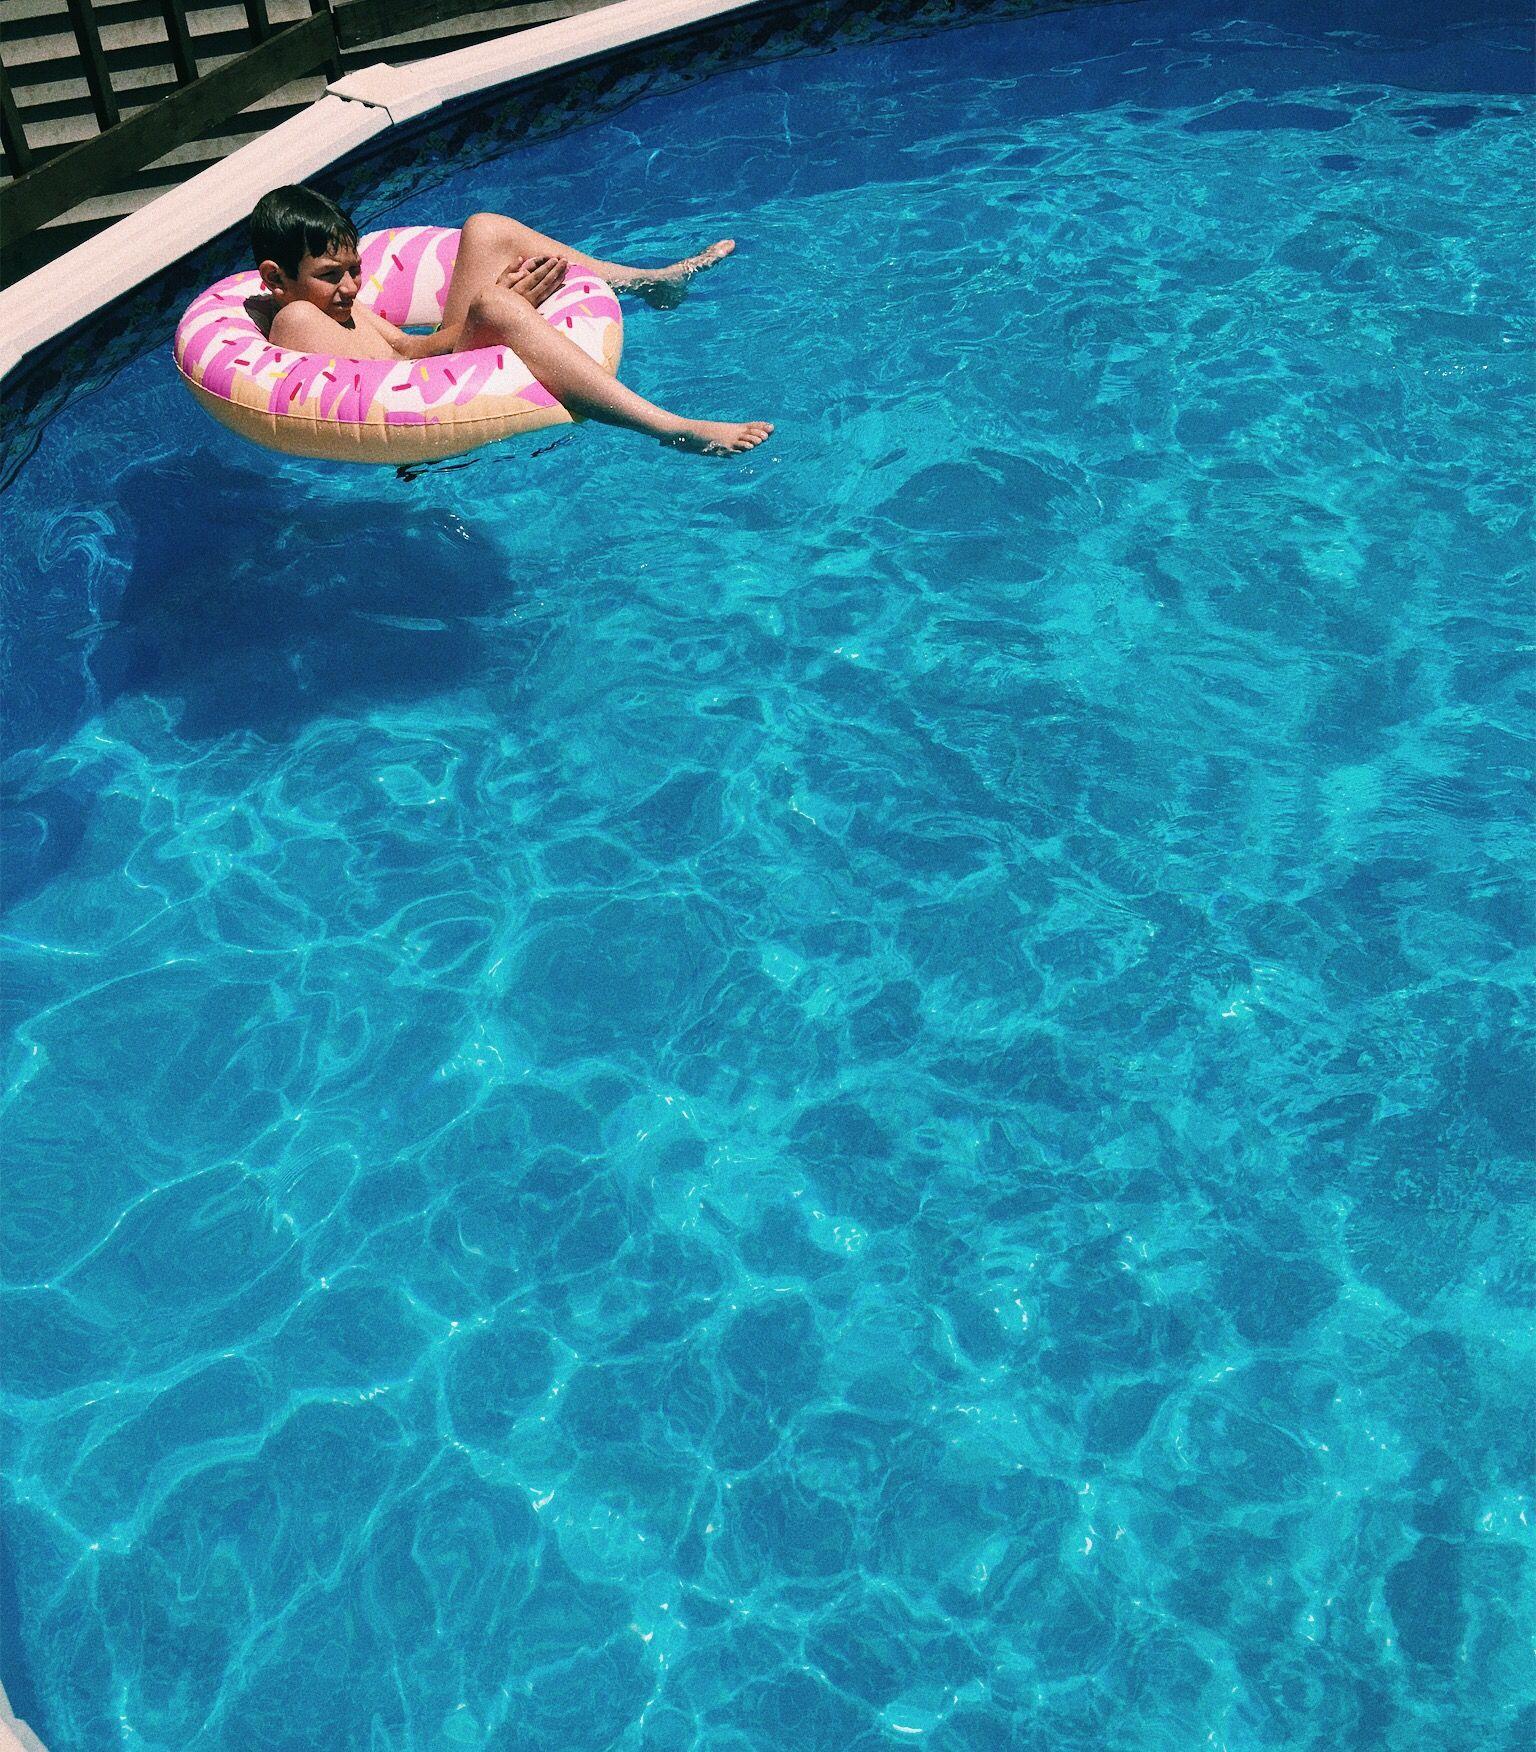 gabriellemoses   Pool float, Outdoor, Float